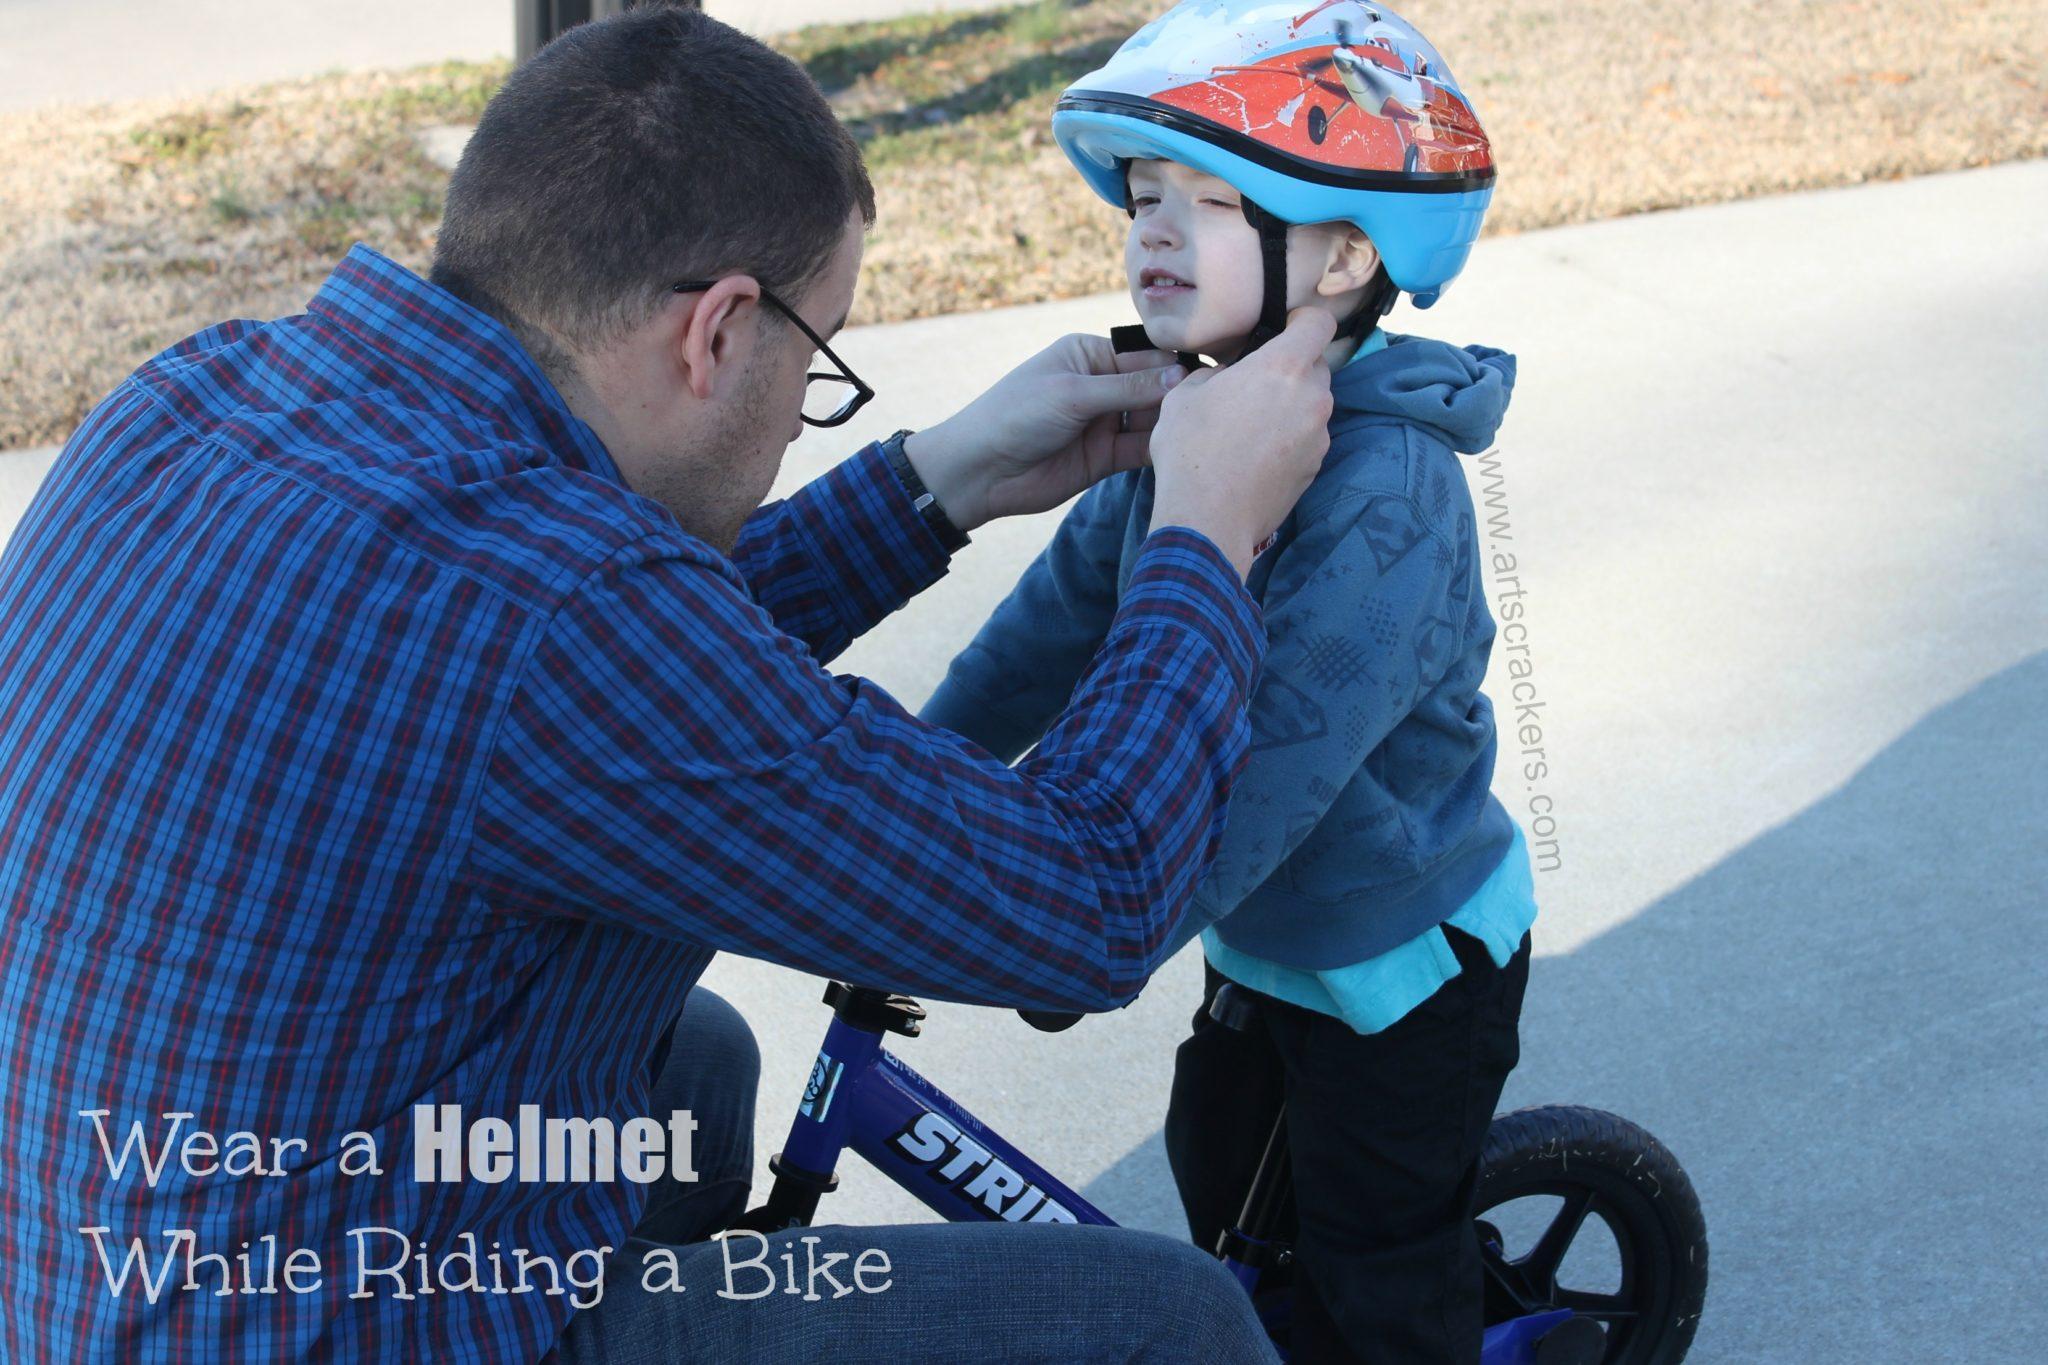 Always Wear a Helmet While Riding a Bike